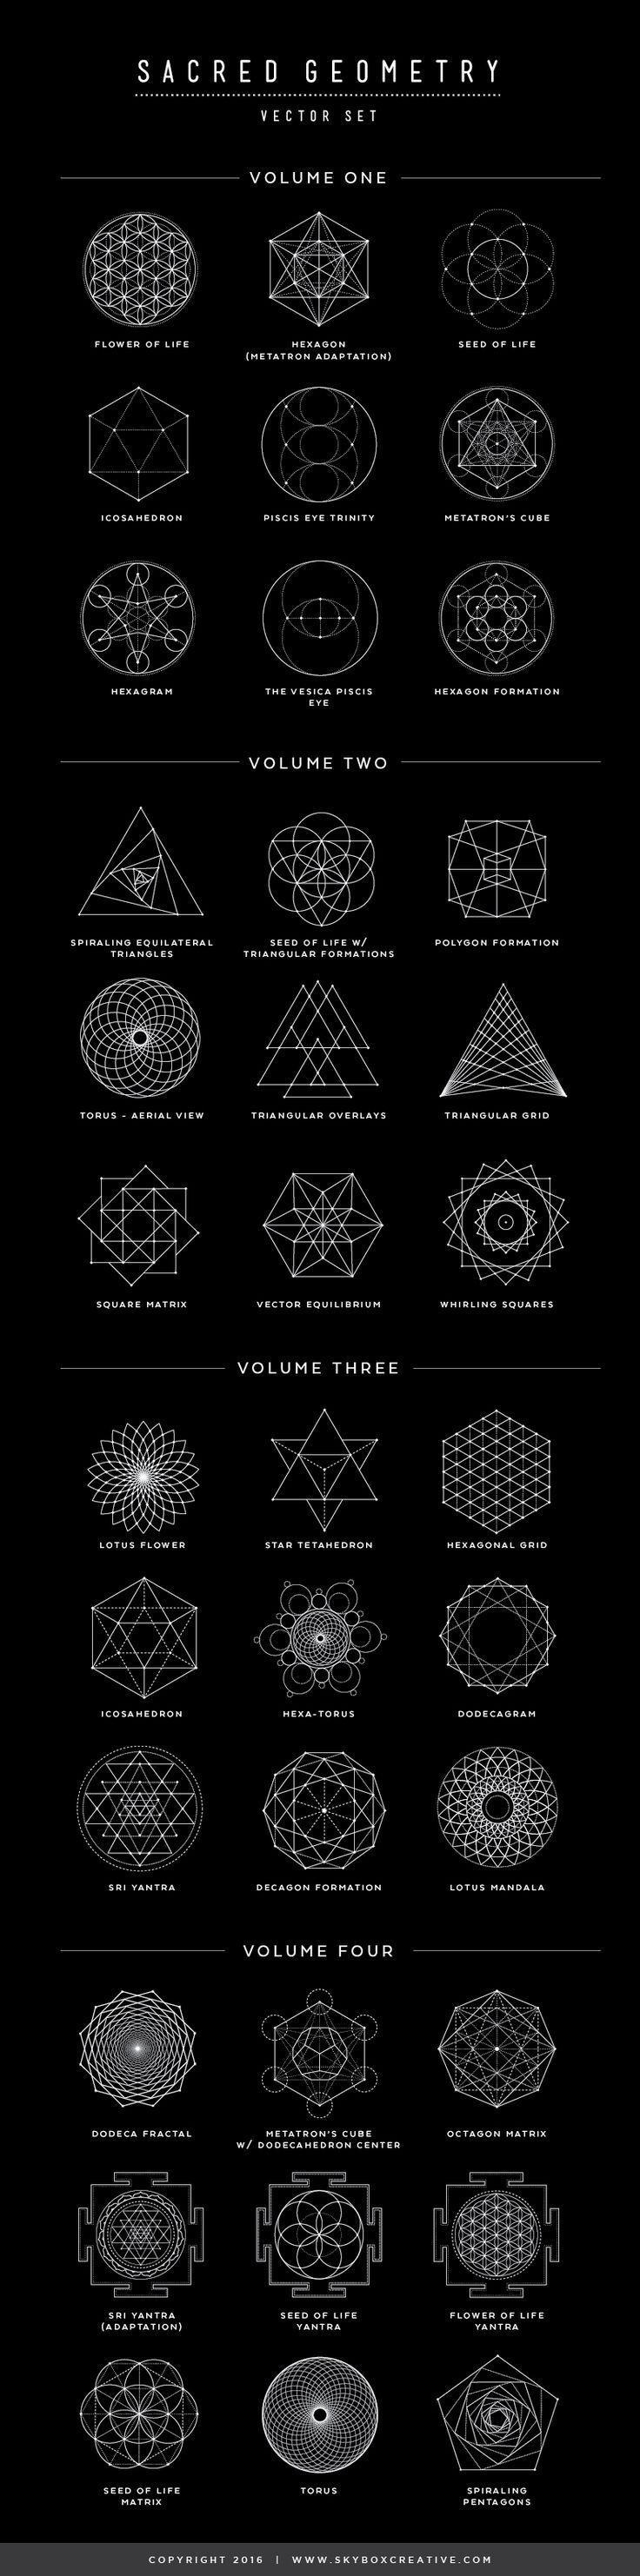 Geometric tattoo  sacred geometry symbols their names and meanings  great tattoo  Geometric tattoo  sacred geometry symbols their names and meanings  great tattoo